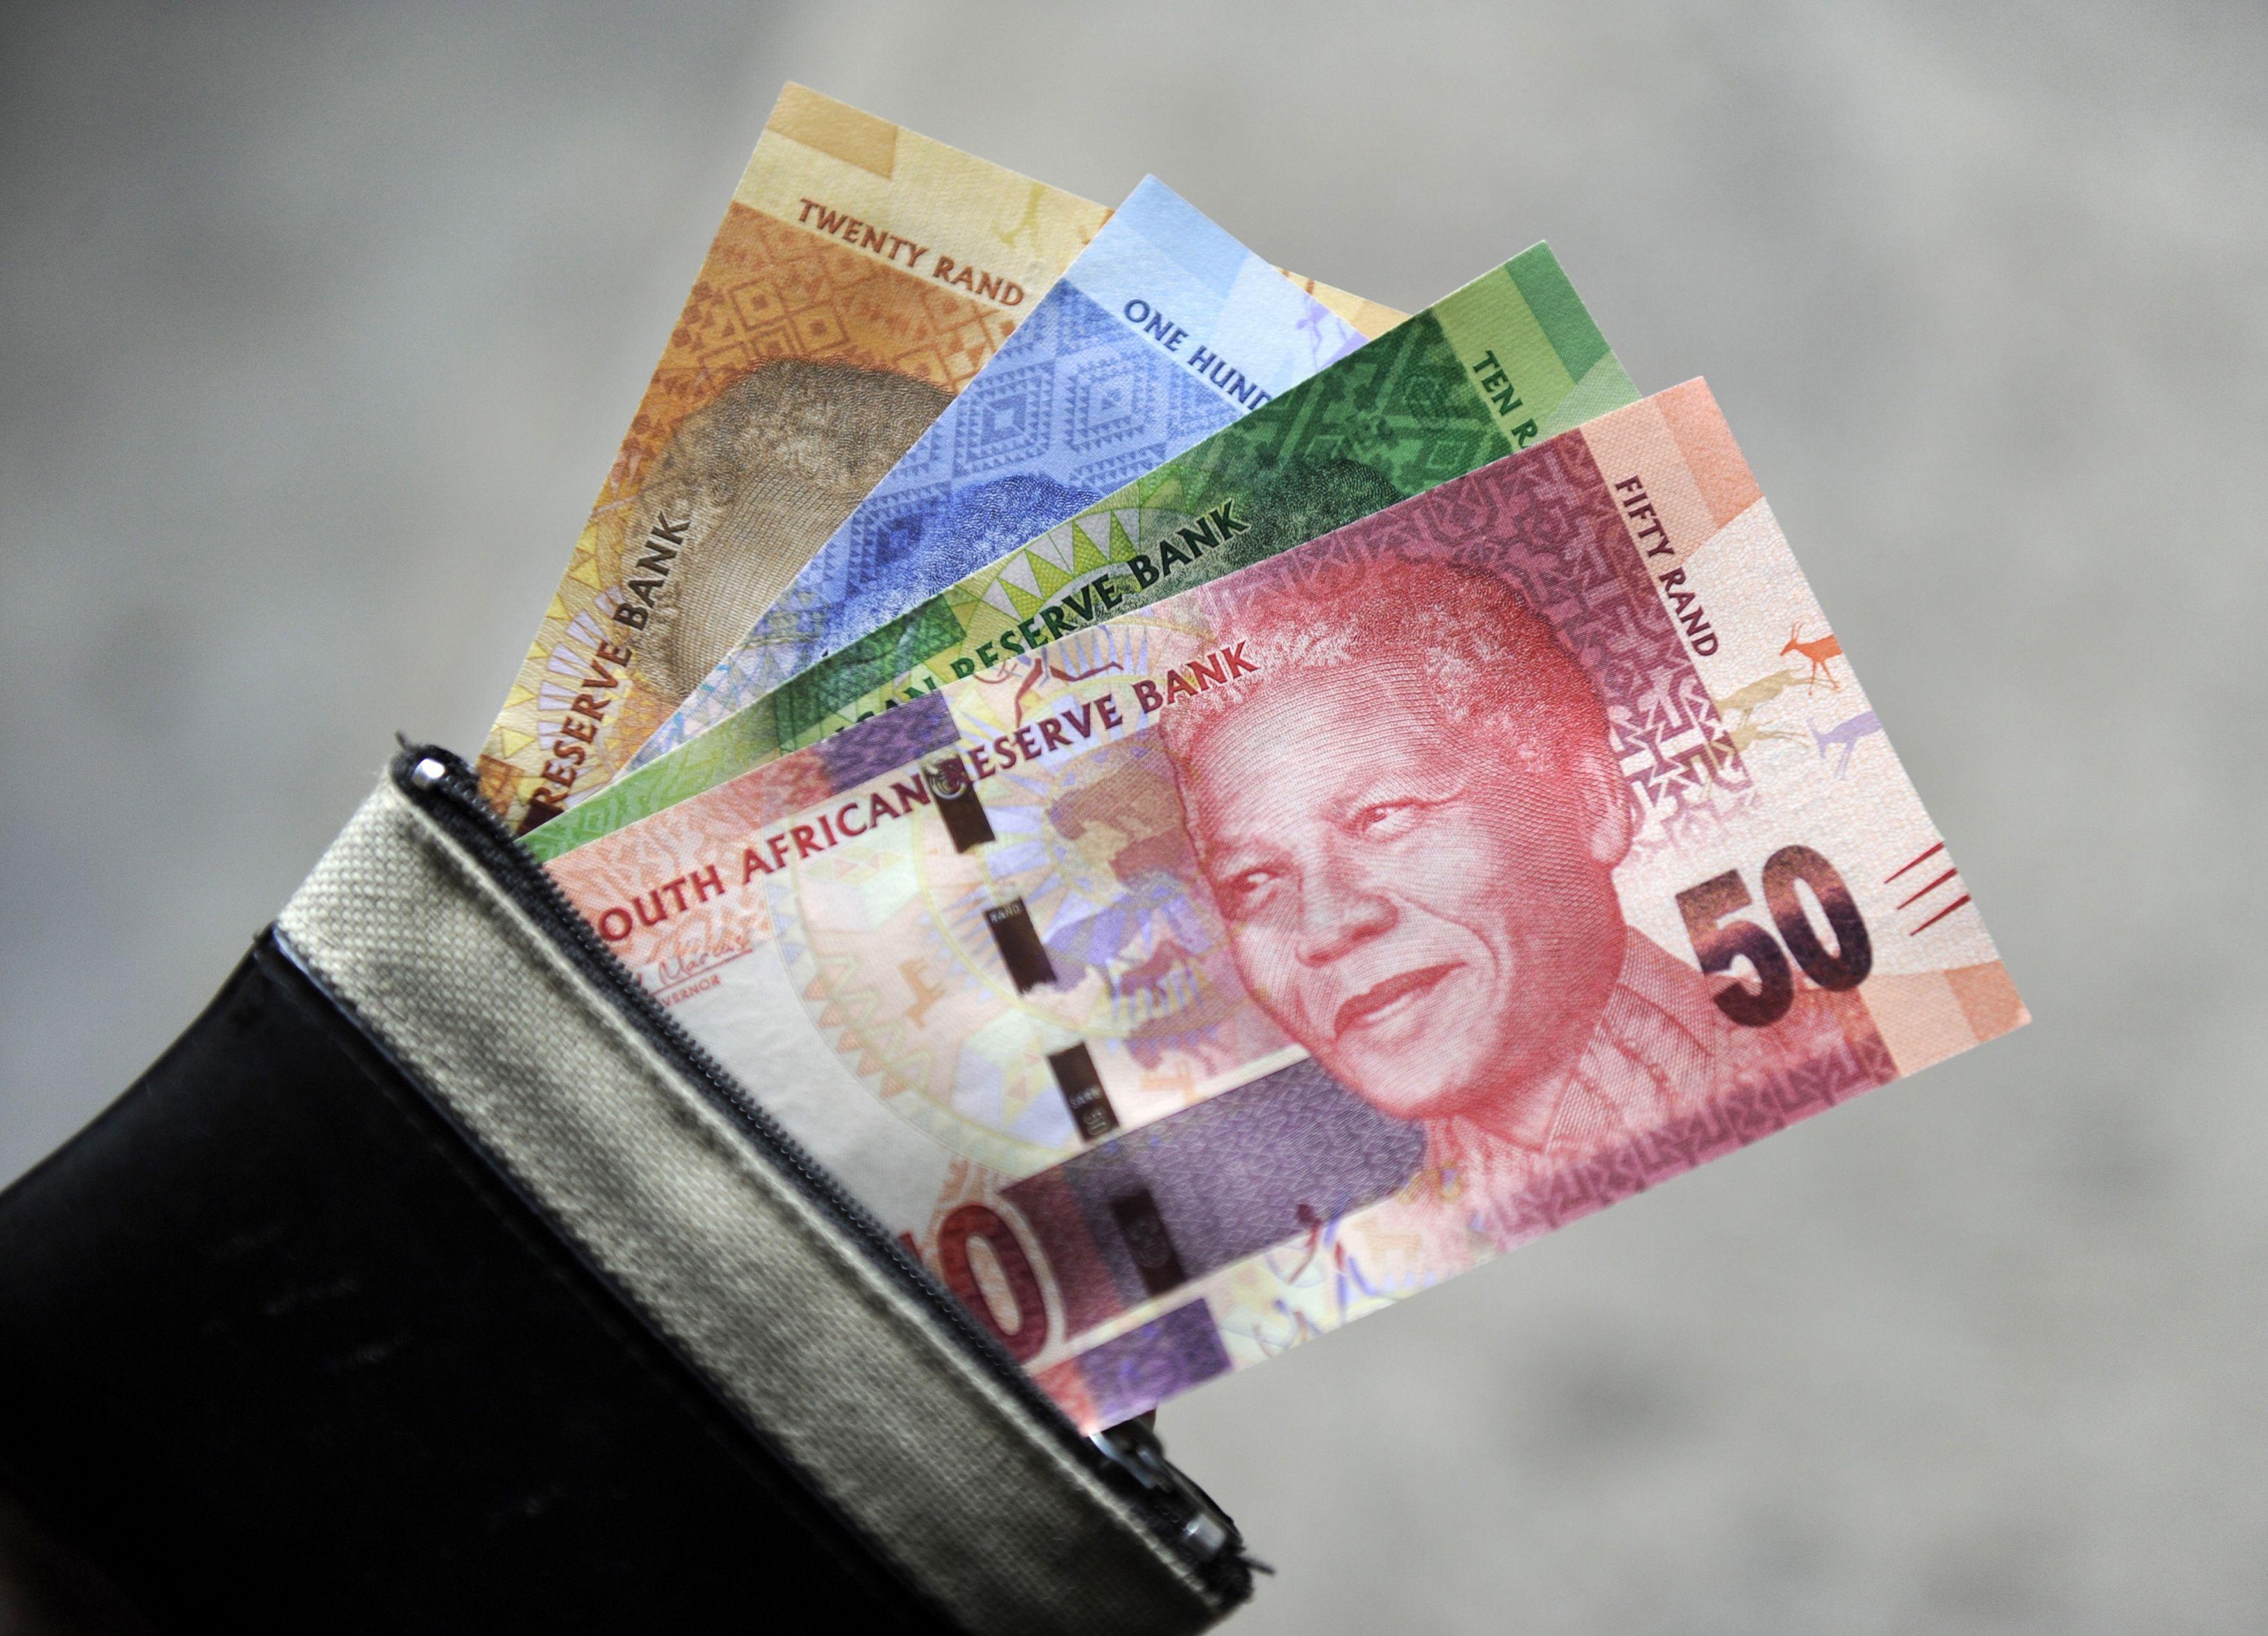 Payday loans in regina sask image 10